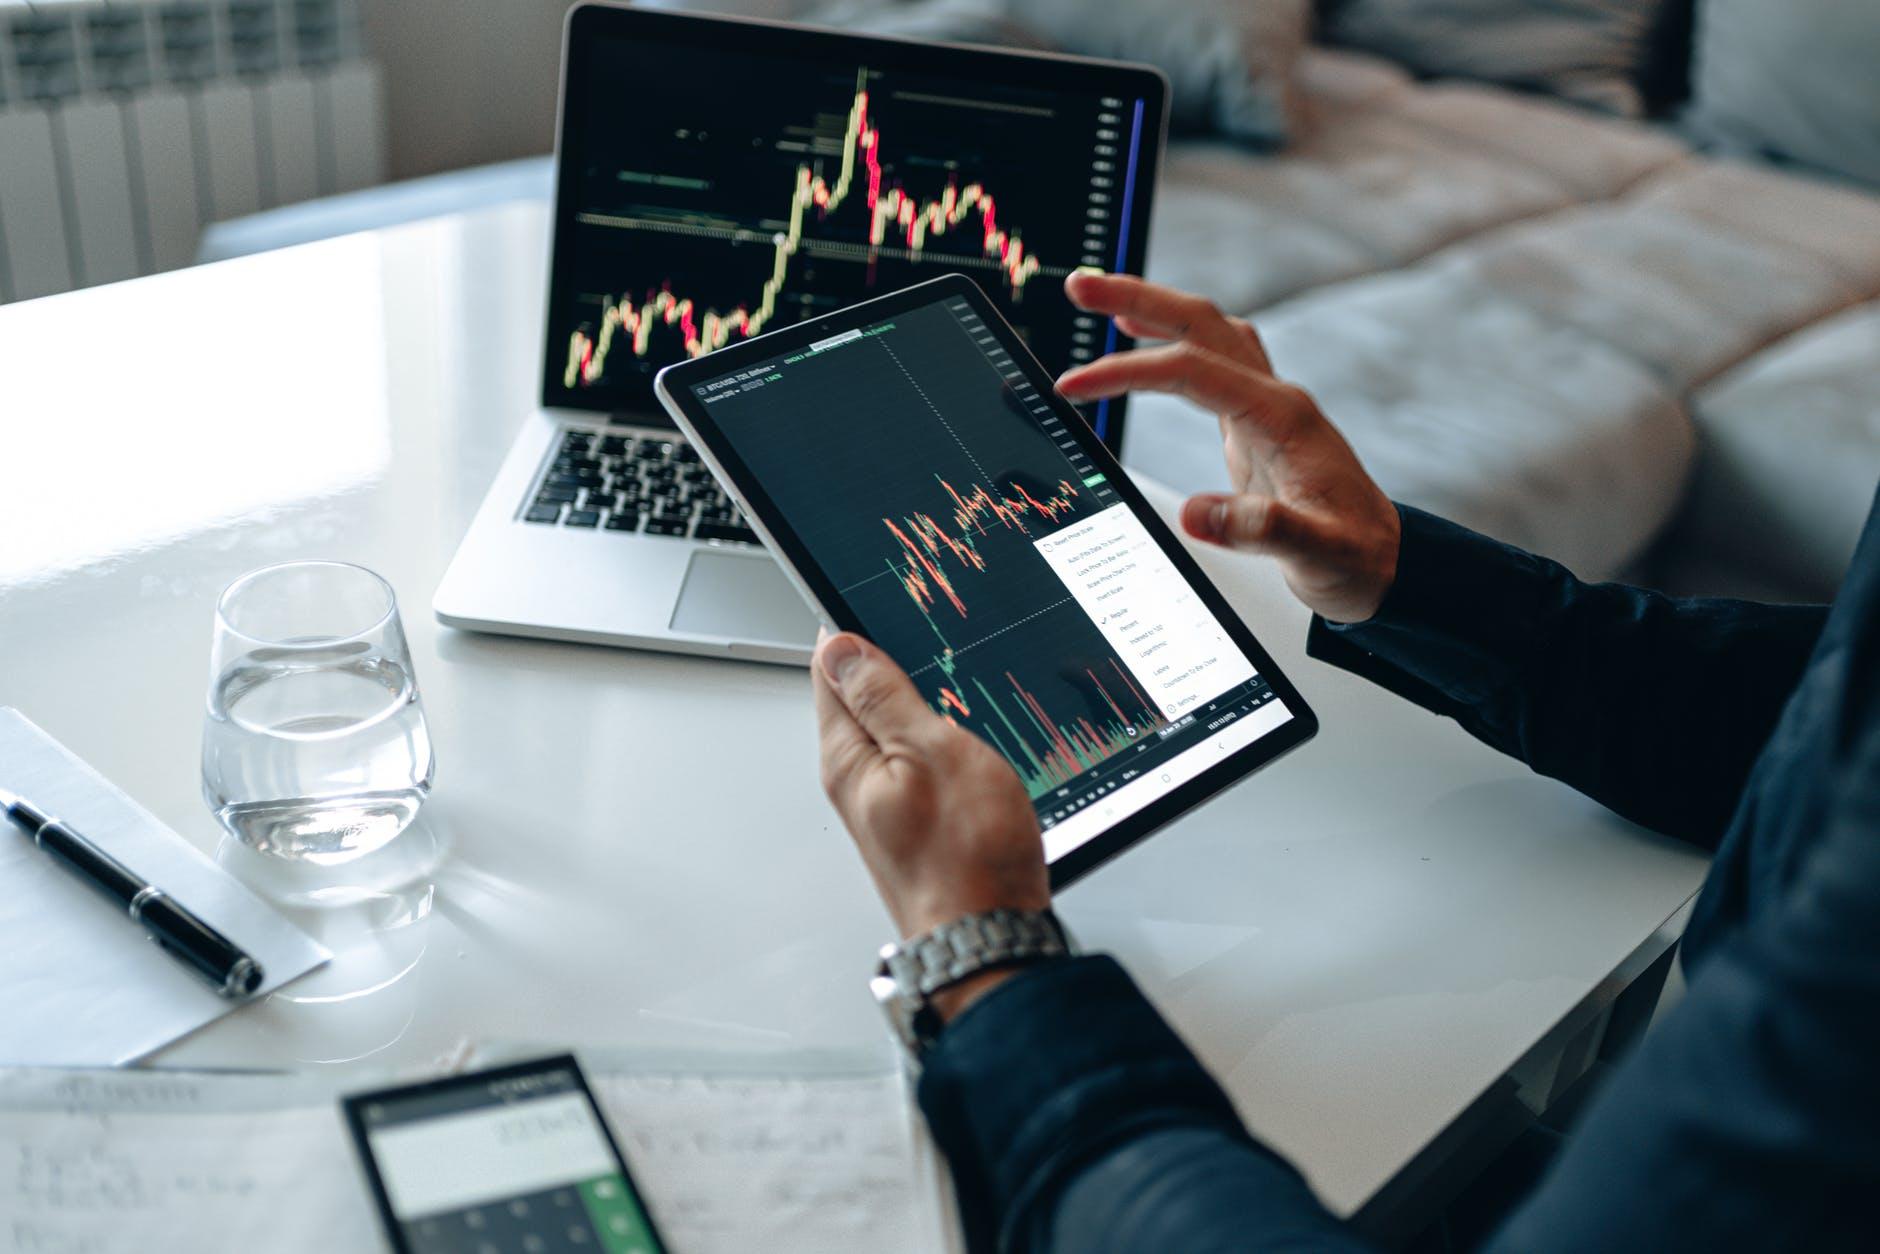 ChemoCentrix CCXI Stock News